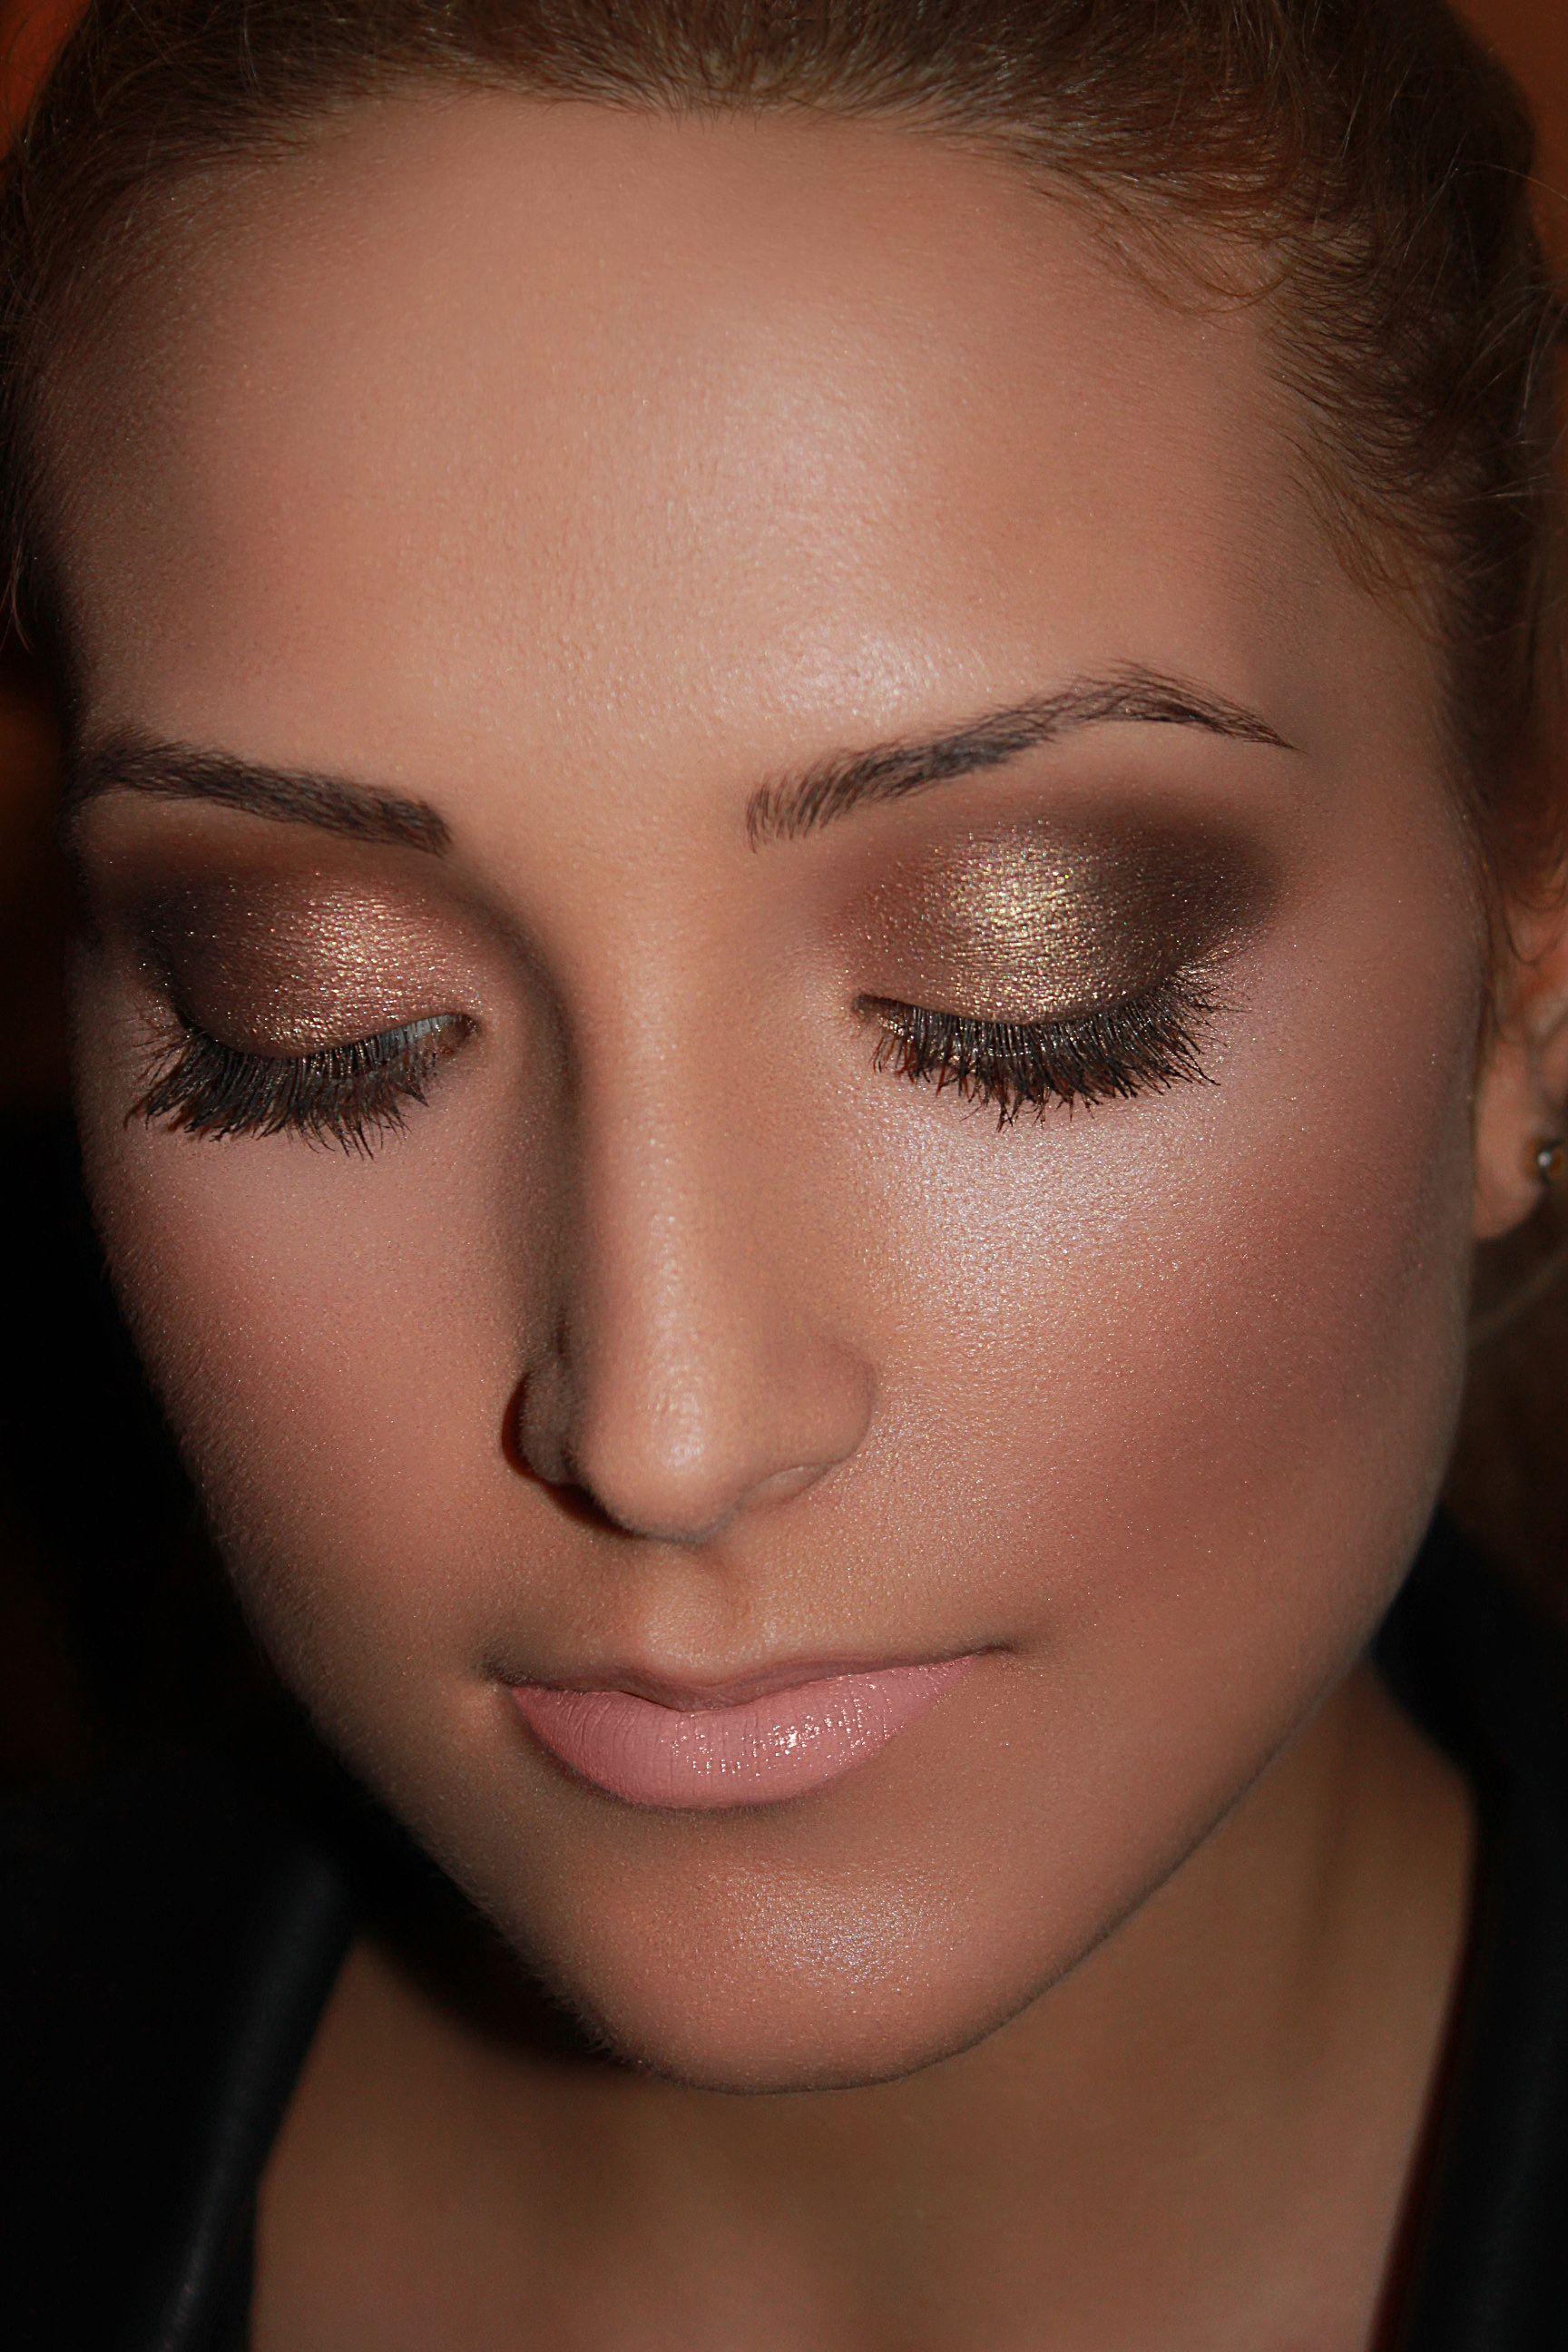 Photo of Make-up bronze eyes www.makeupjldc.com